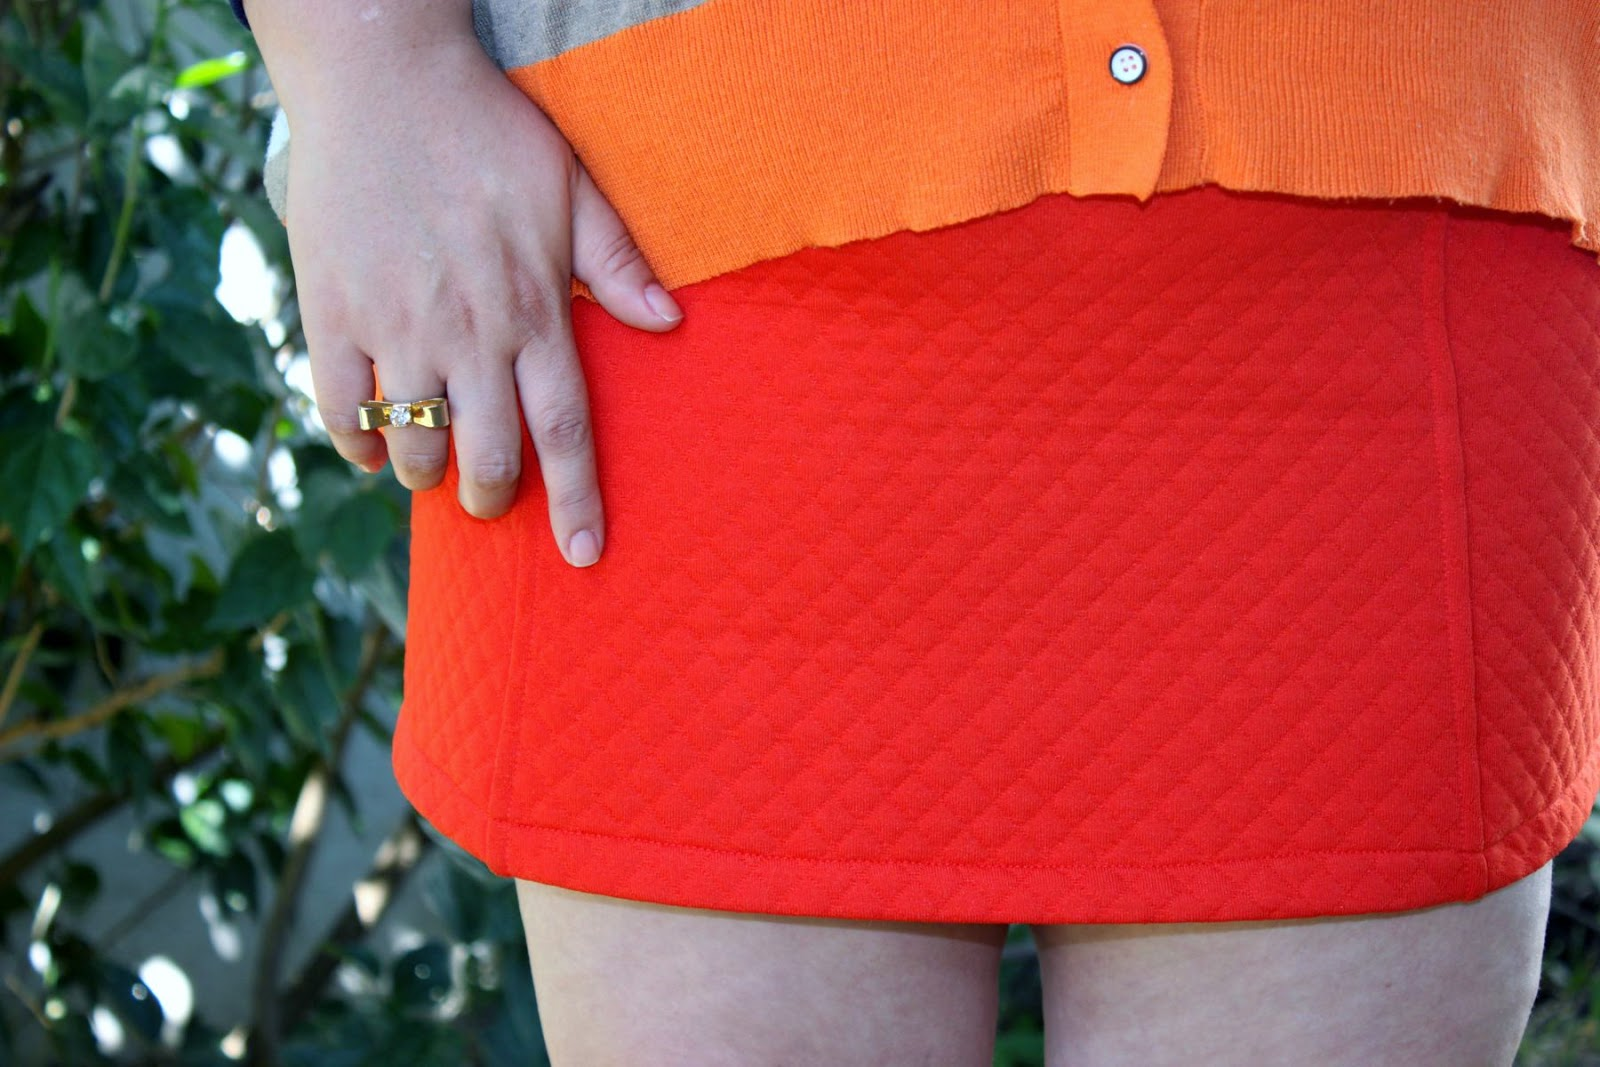 malha, matelasse, saia, skirt, laranja, orange, look me, look, plus size, moda, fashion, fashion mimi, look do dia, look of the day, prada, óculos, glasses, shoes, sapato nude, brás, kara plus size, gato, gordinha